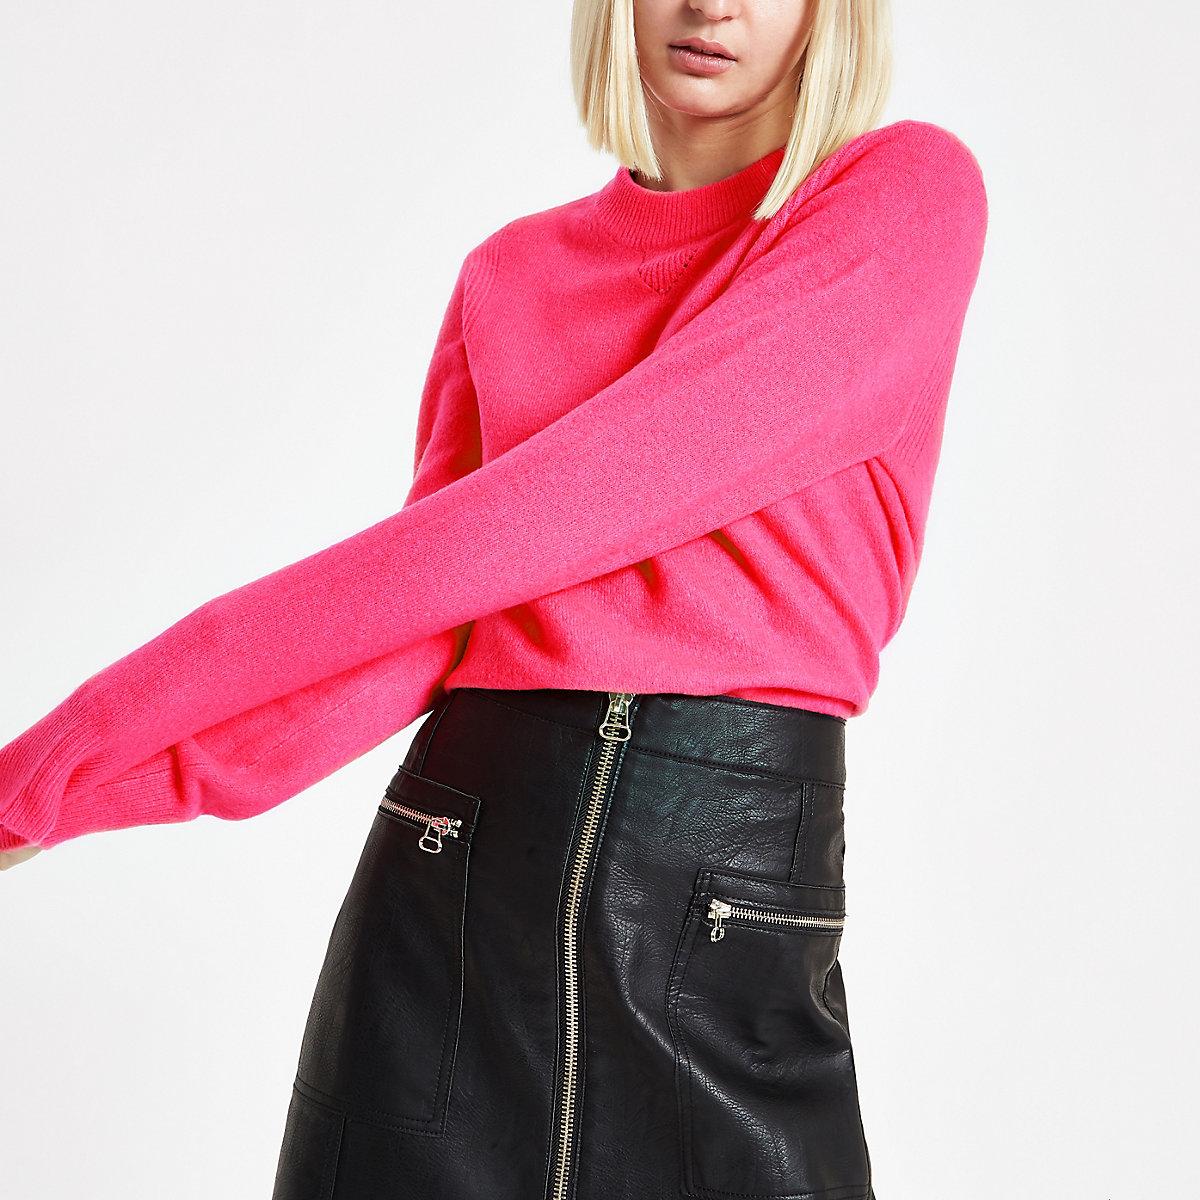 Bright pink crew neck sweater